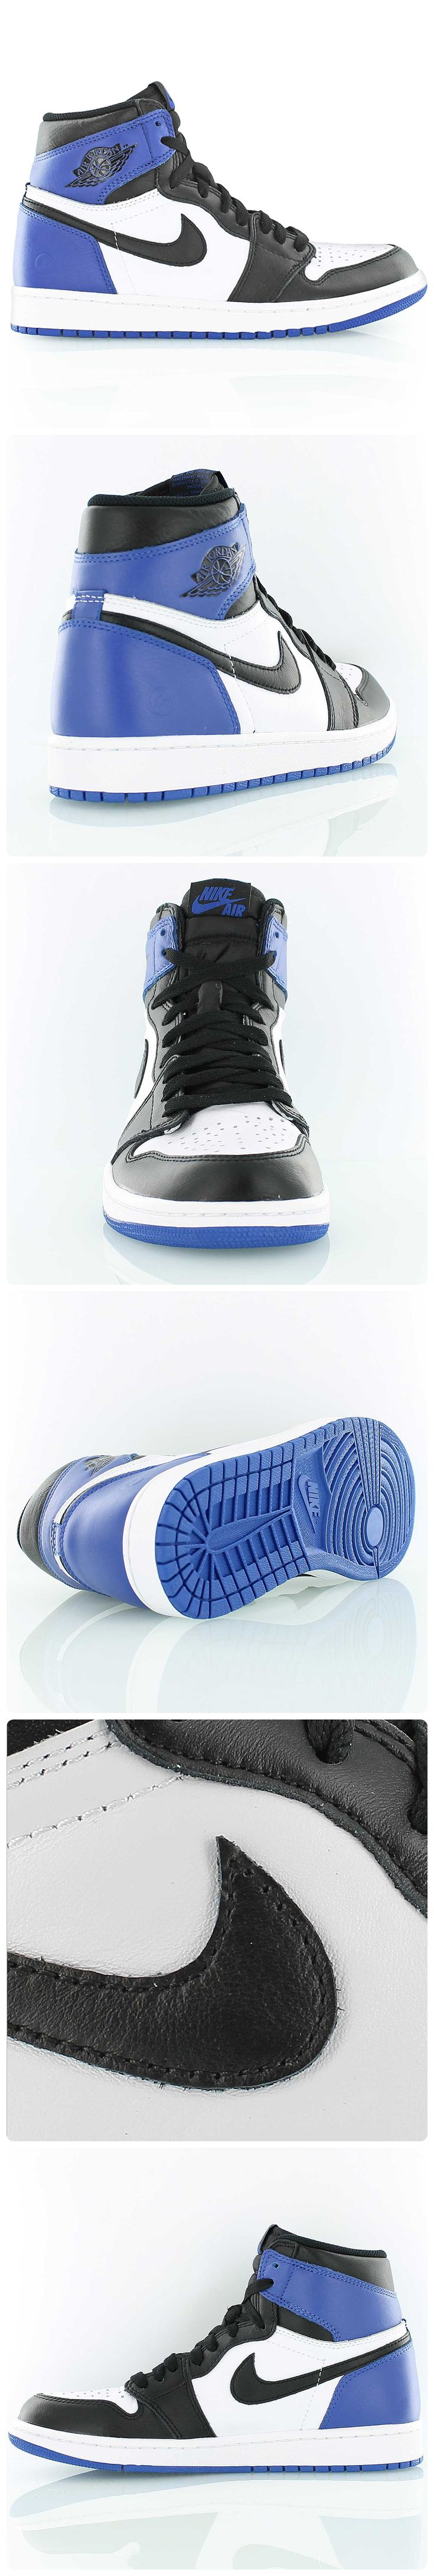 Air Jordan 1 x Fragment designed by Hiroshi Fujiwara. Coming soon to KICKZ.com